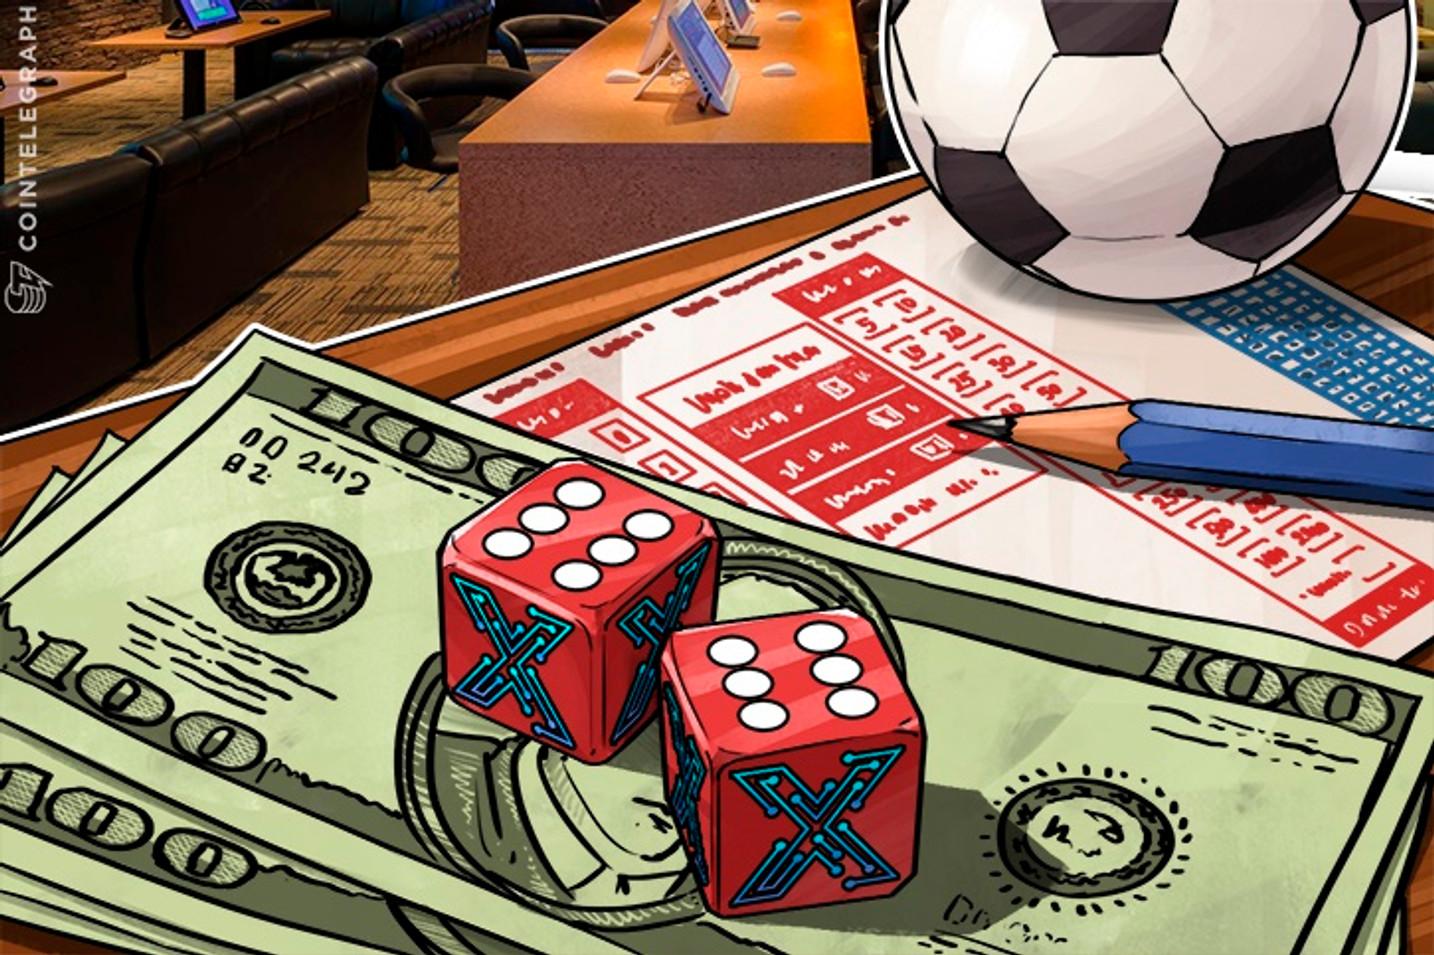 Guía Apuestas Depotivas - Aprende a apostar como un experto